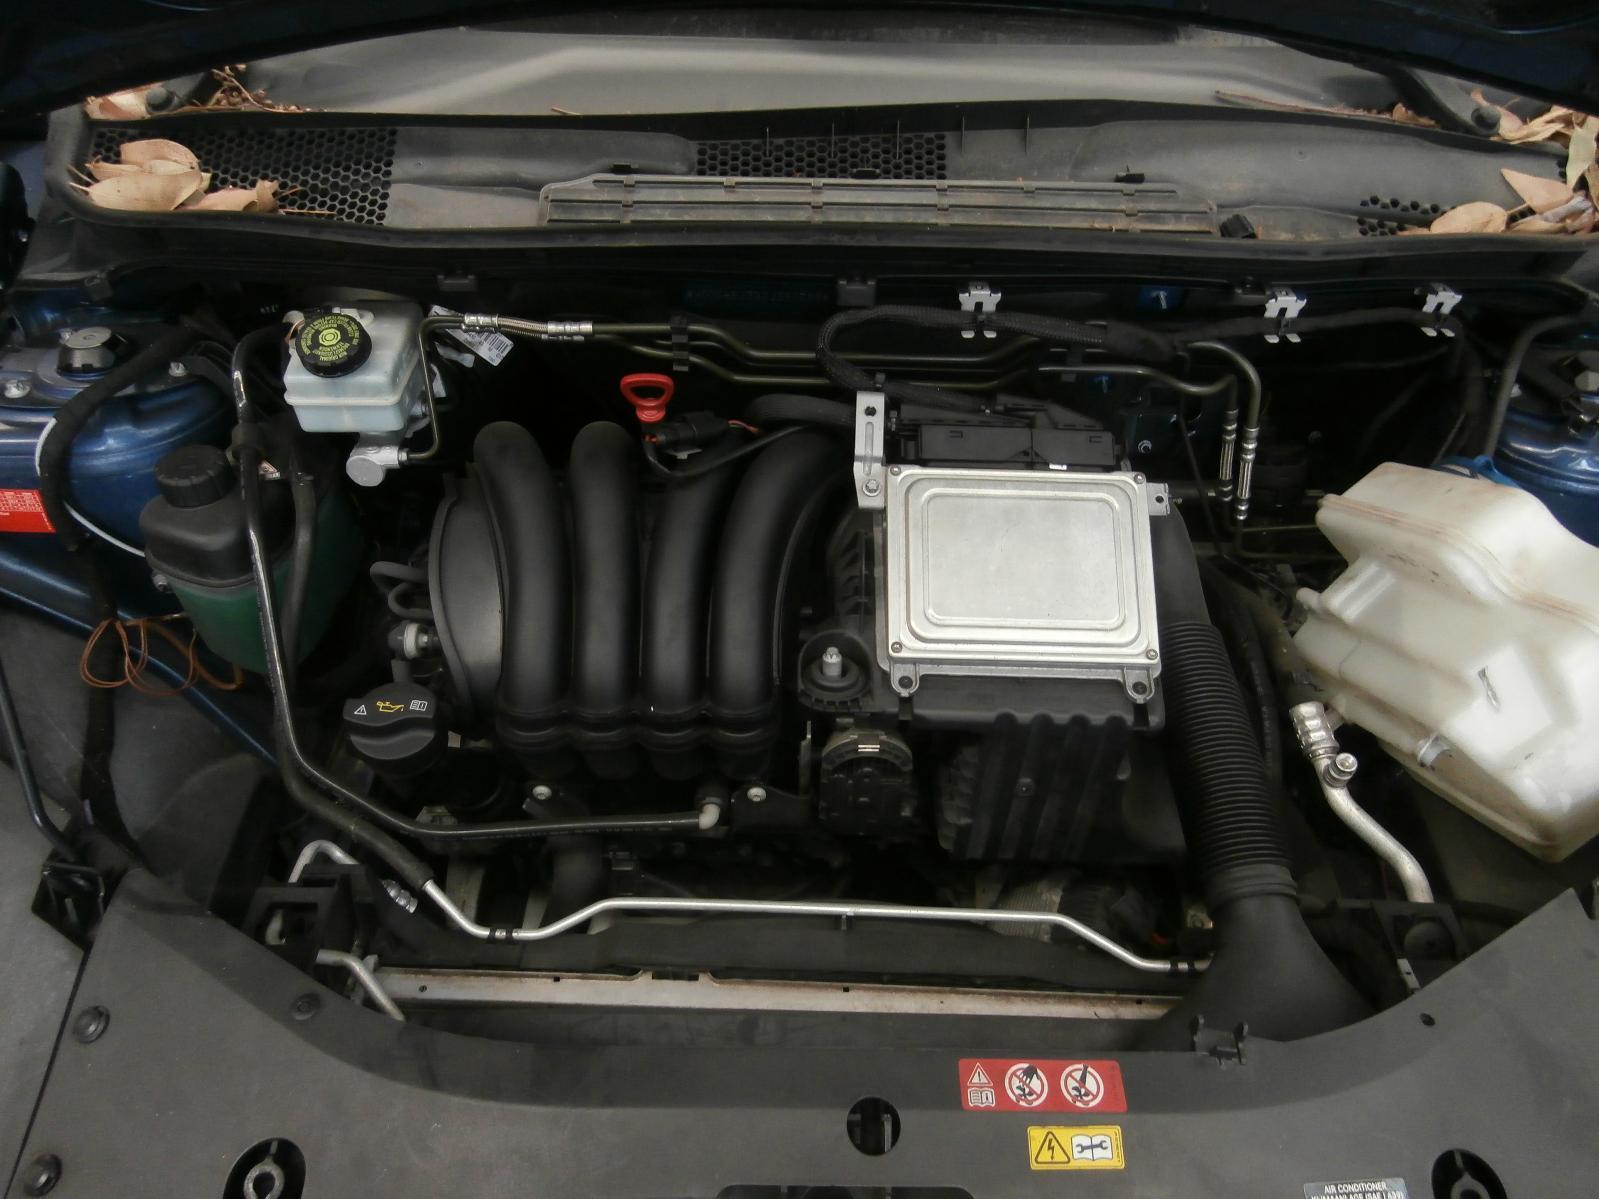 View Auto part Engine Mercedes B Class 2009